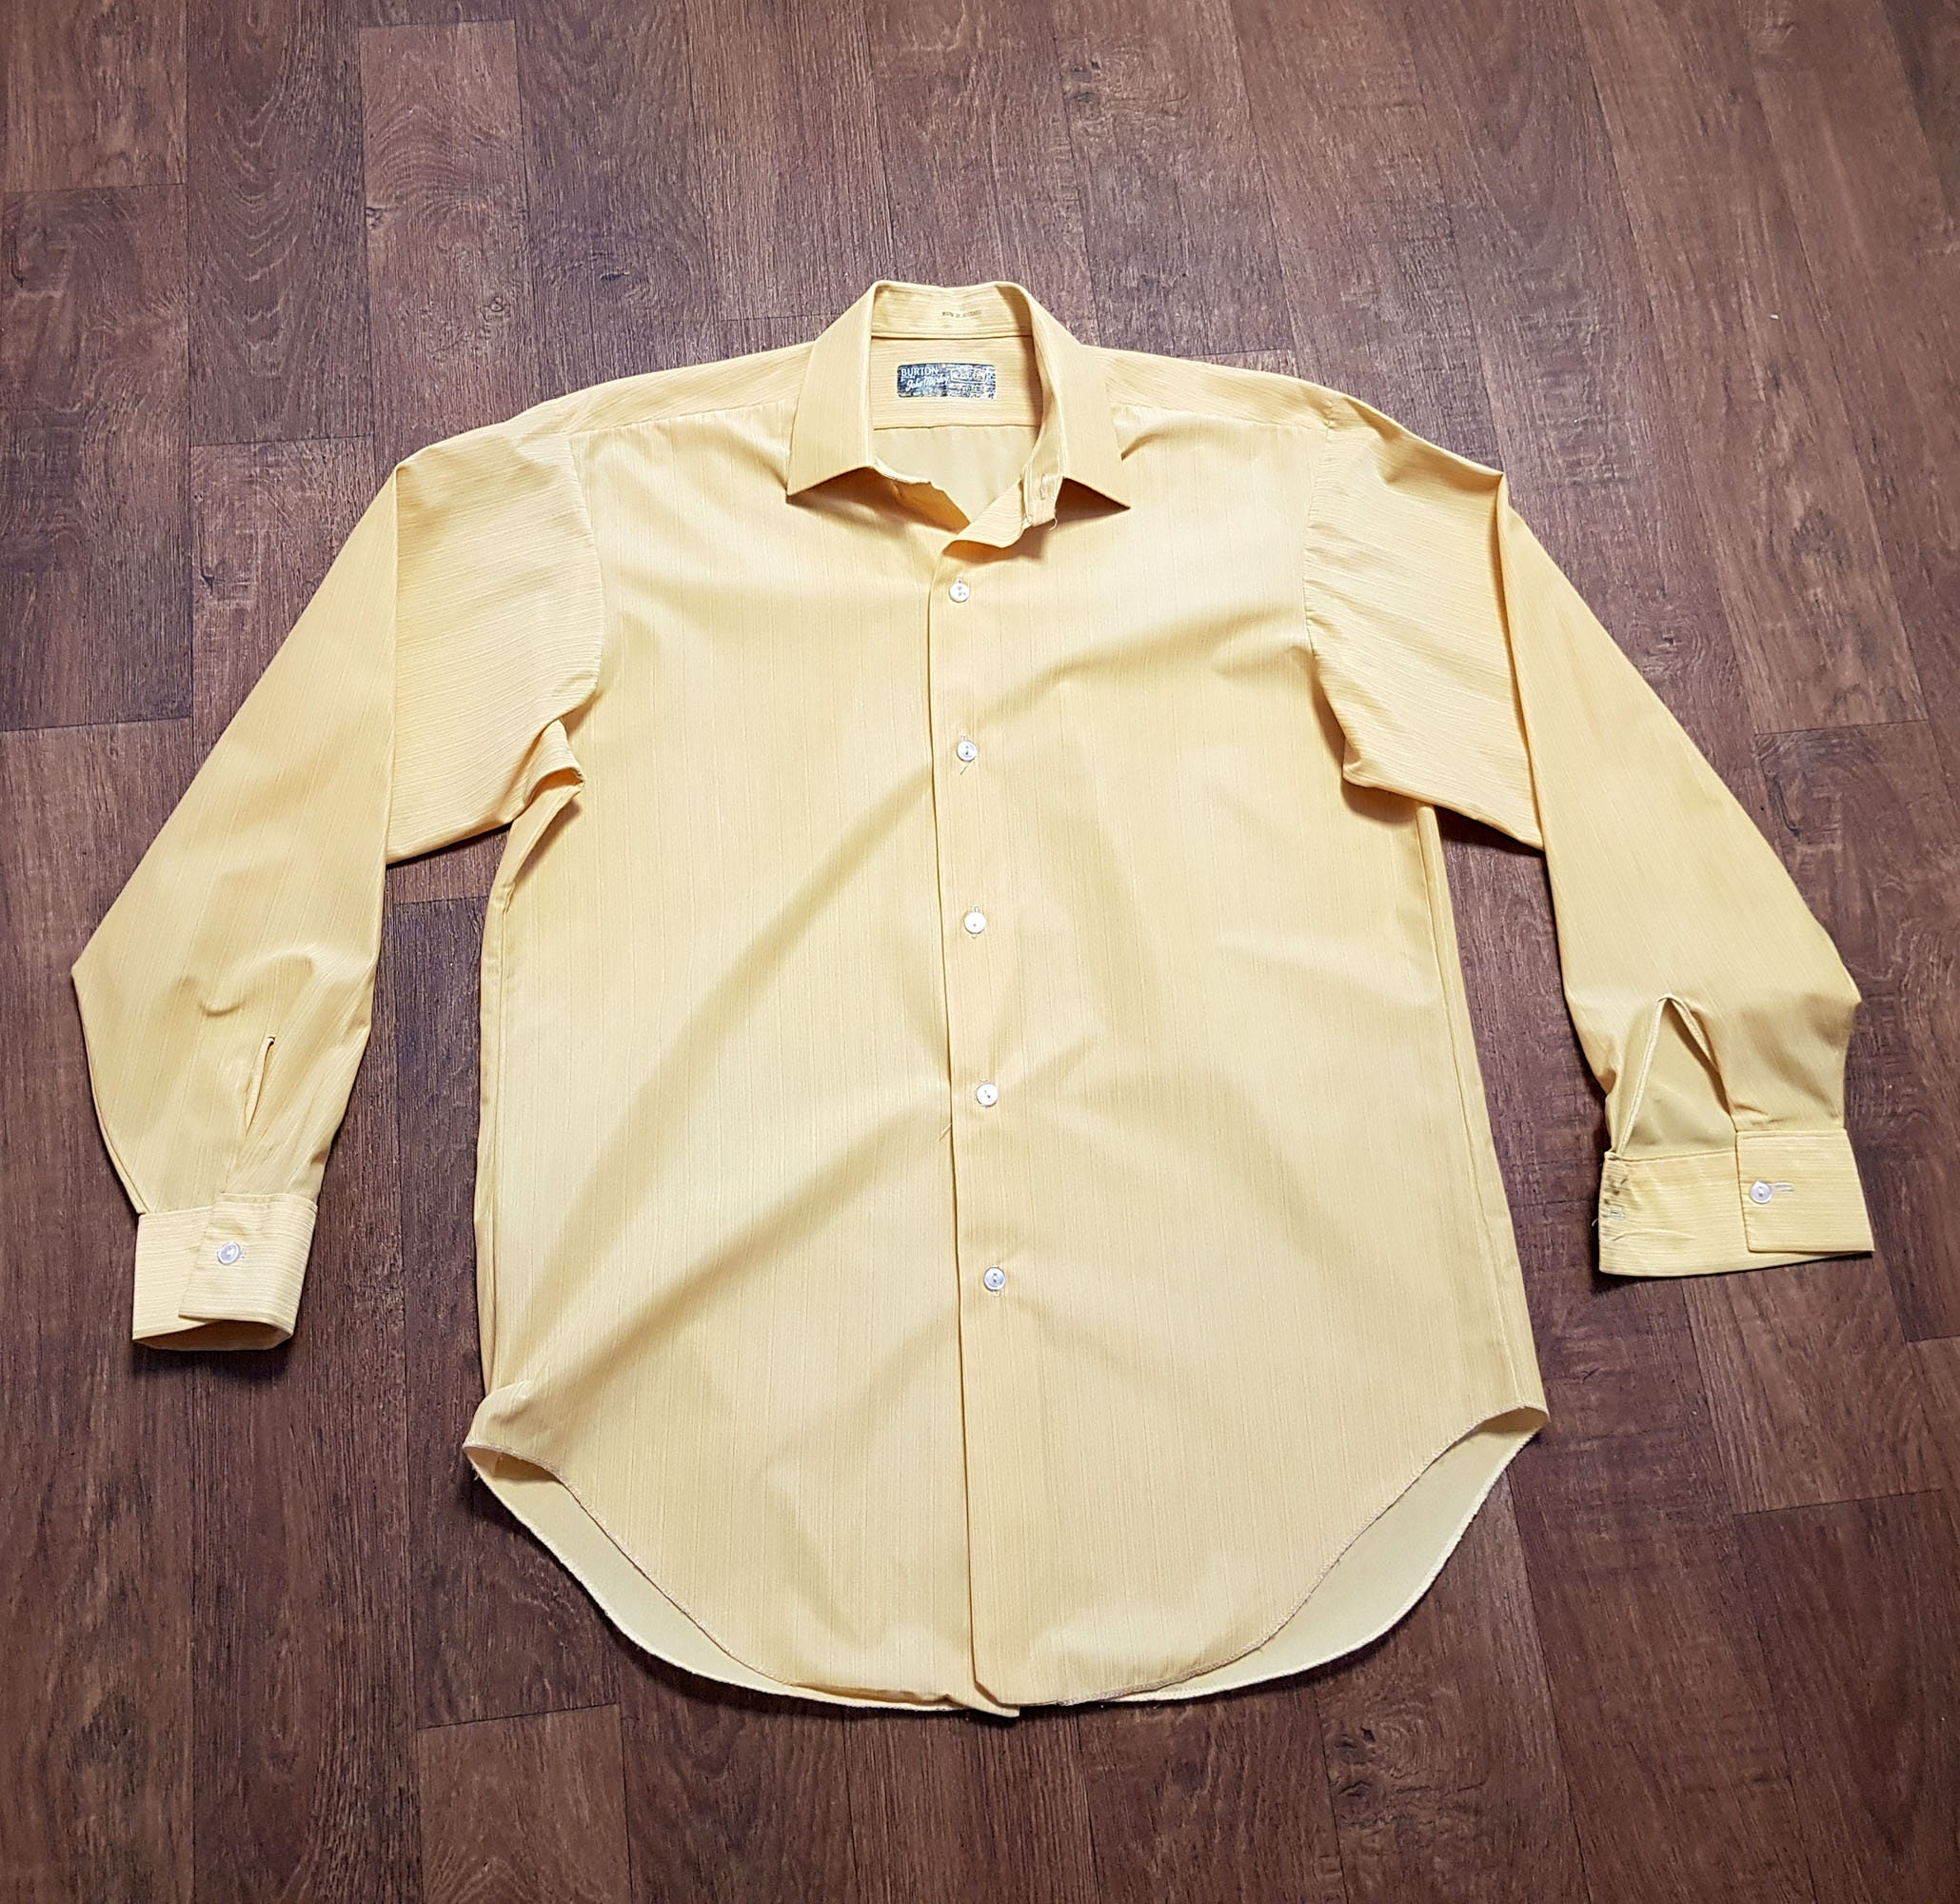 1970s Men's Shirt Styles – Vintage 70s Shirts for Guys Mens Vintage Shirt  1970S Mustard Yellow Uk Size Large Clothing, Menswear, Mens $51.52 AT vintagedancer.com